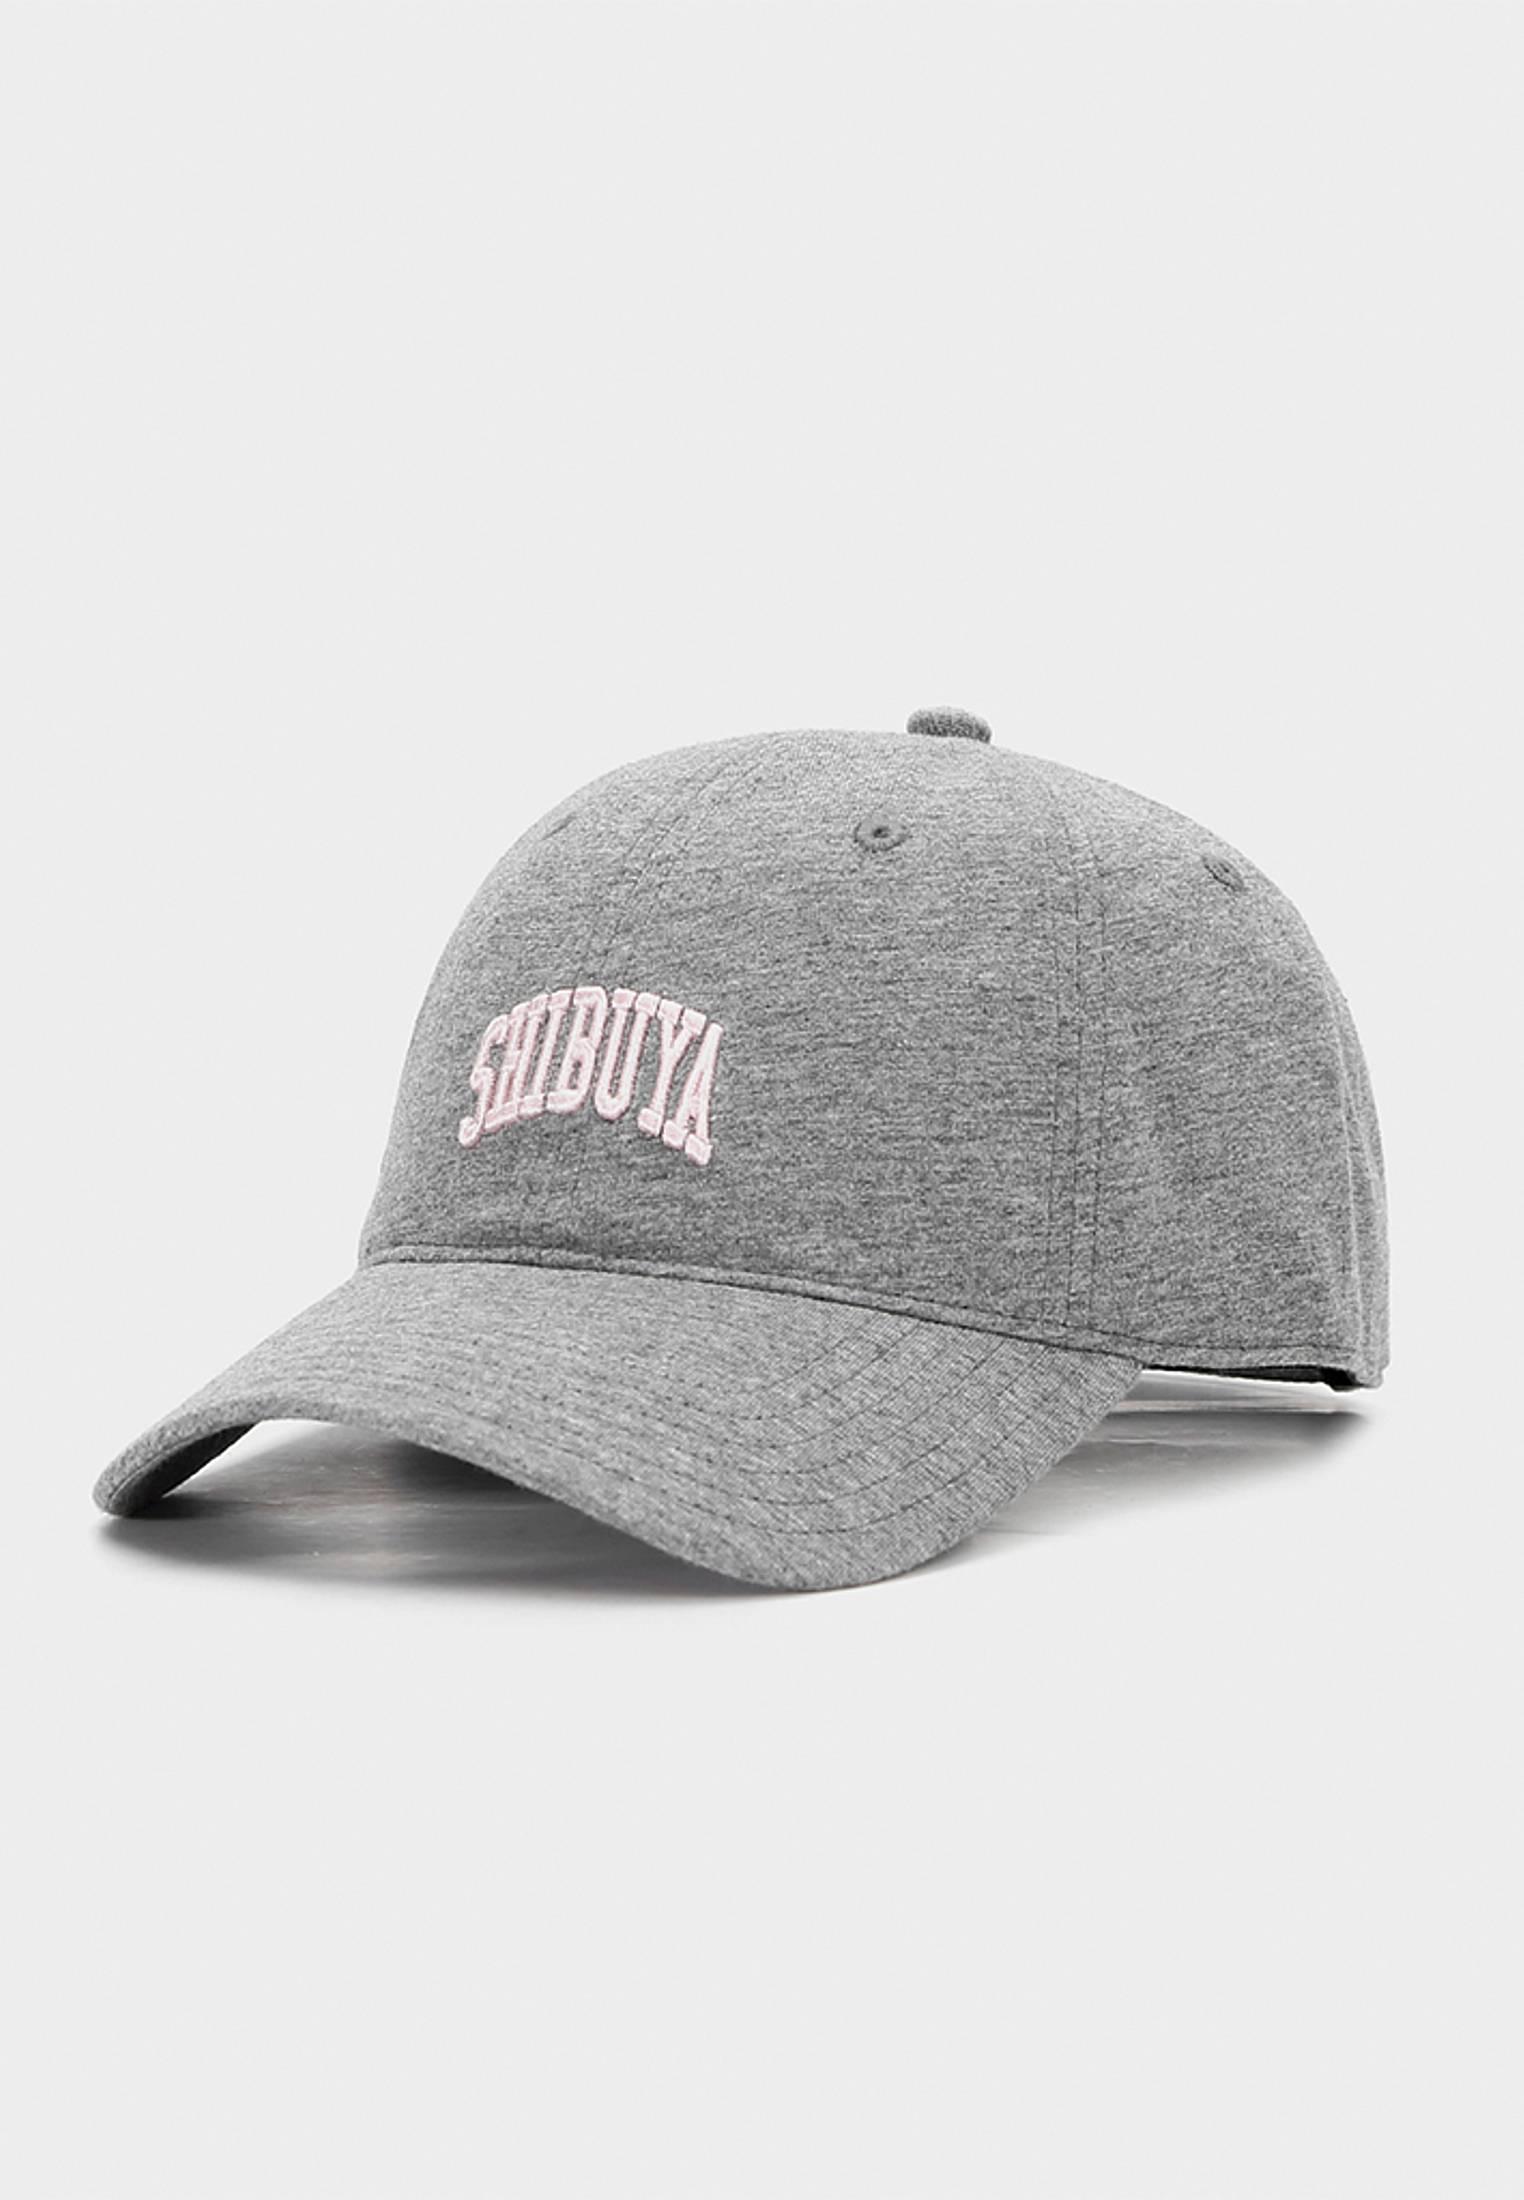 Urban Classics CSBL Oath Curved Cap grey heather - One Size